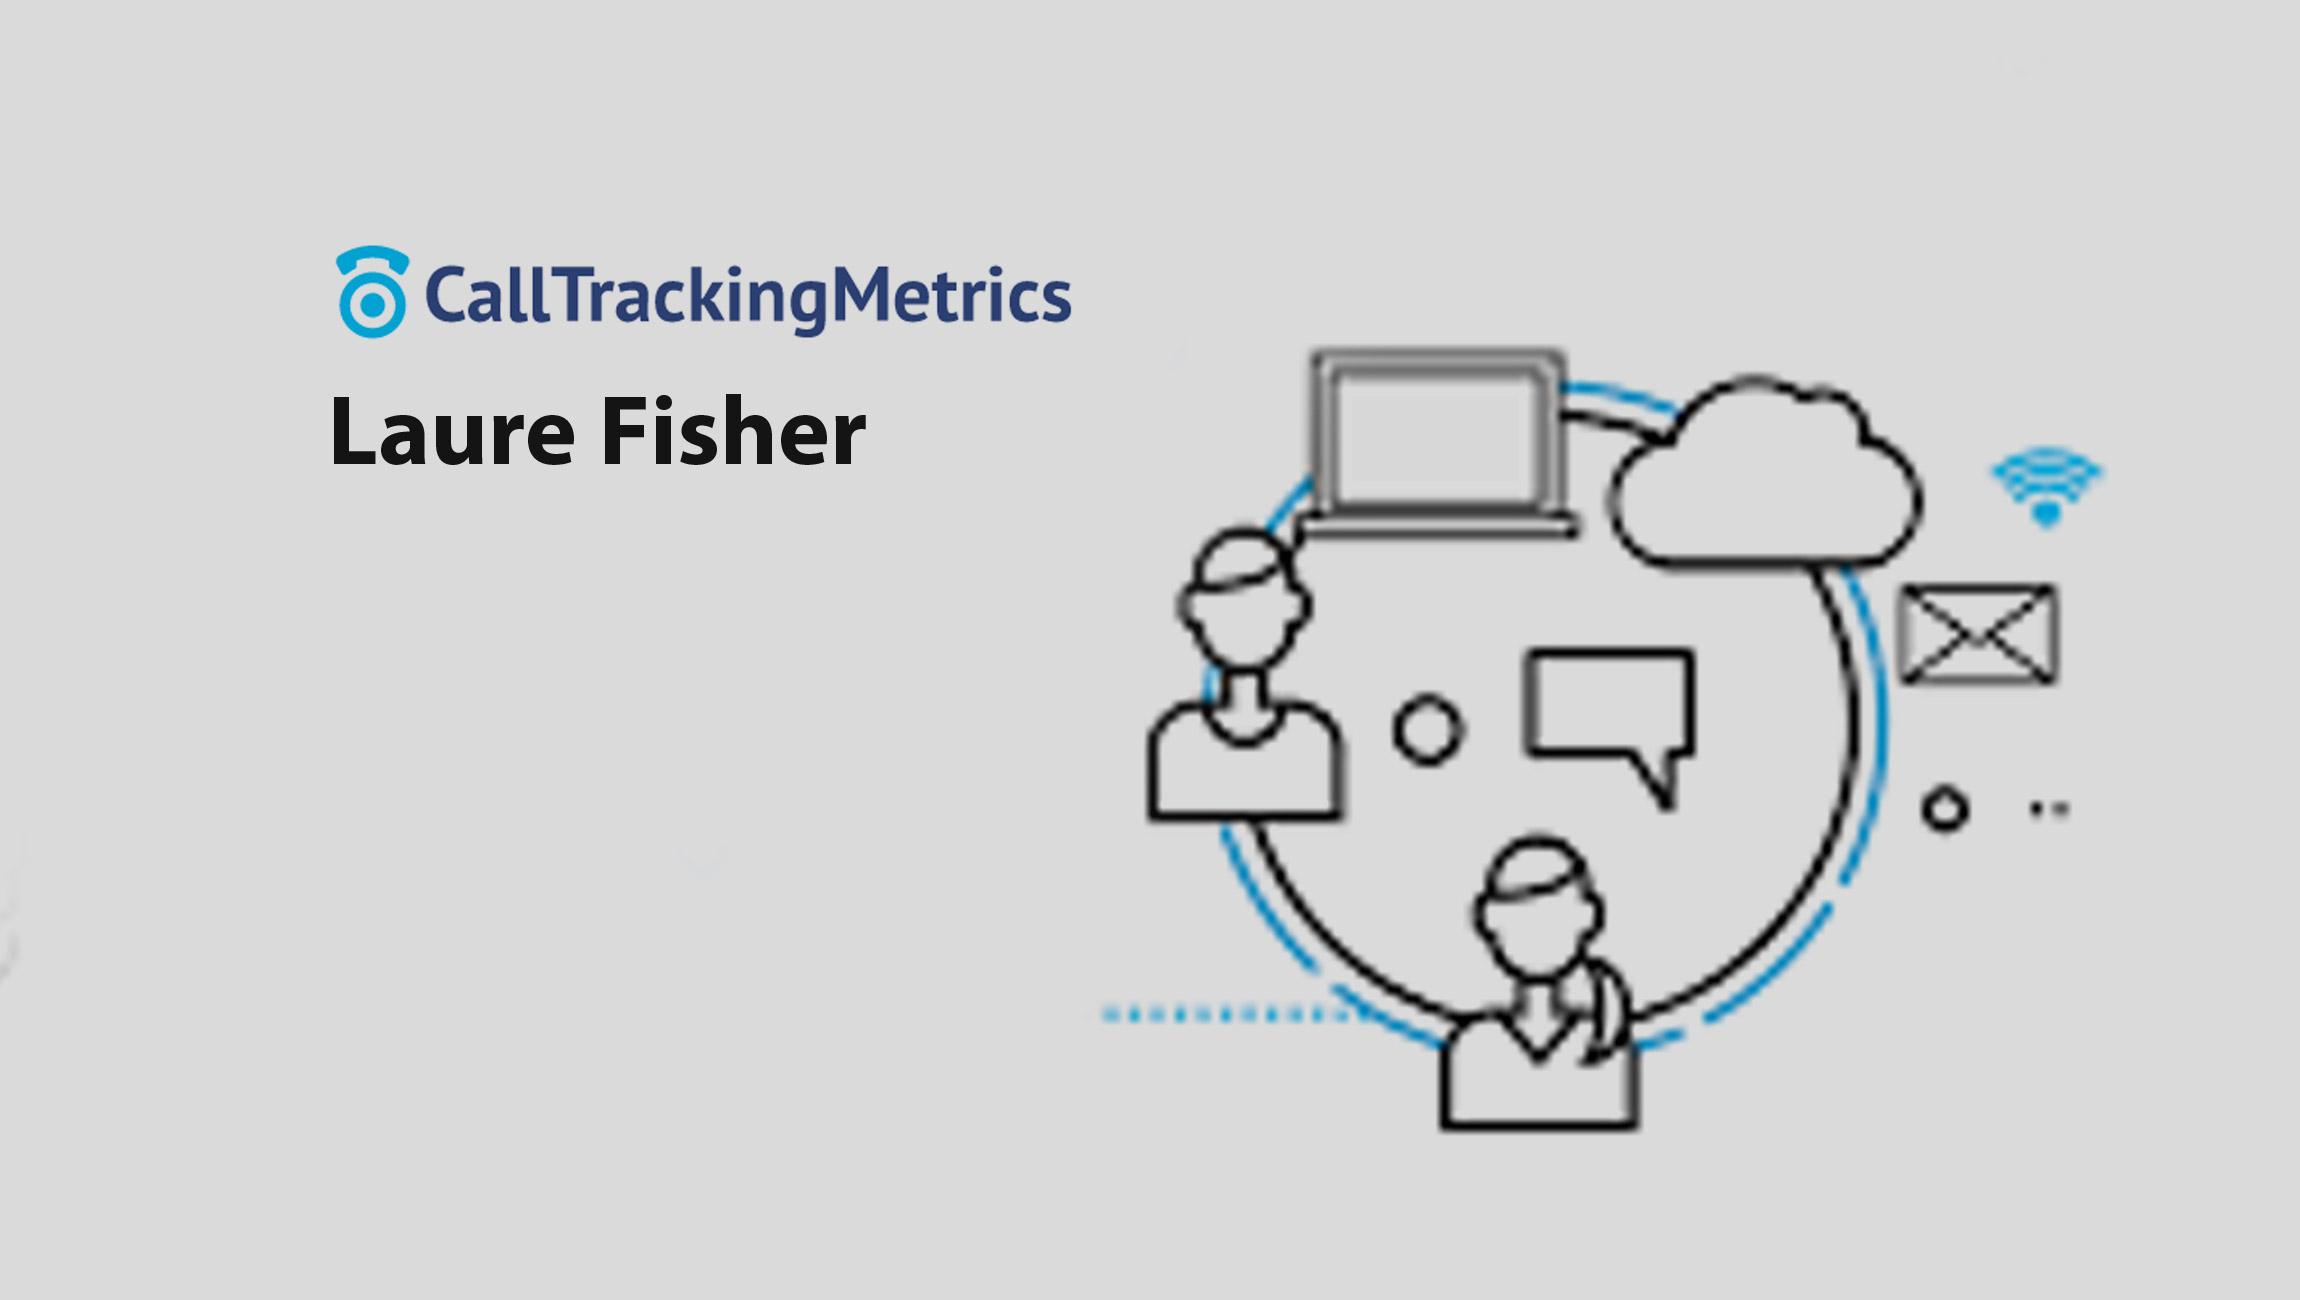 Laure-Fisher-SalesTechStar-guest-CallTrackingMetrics